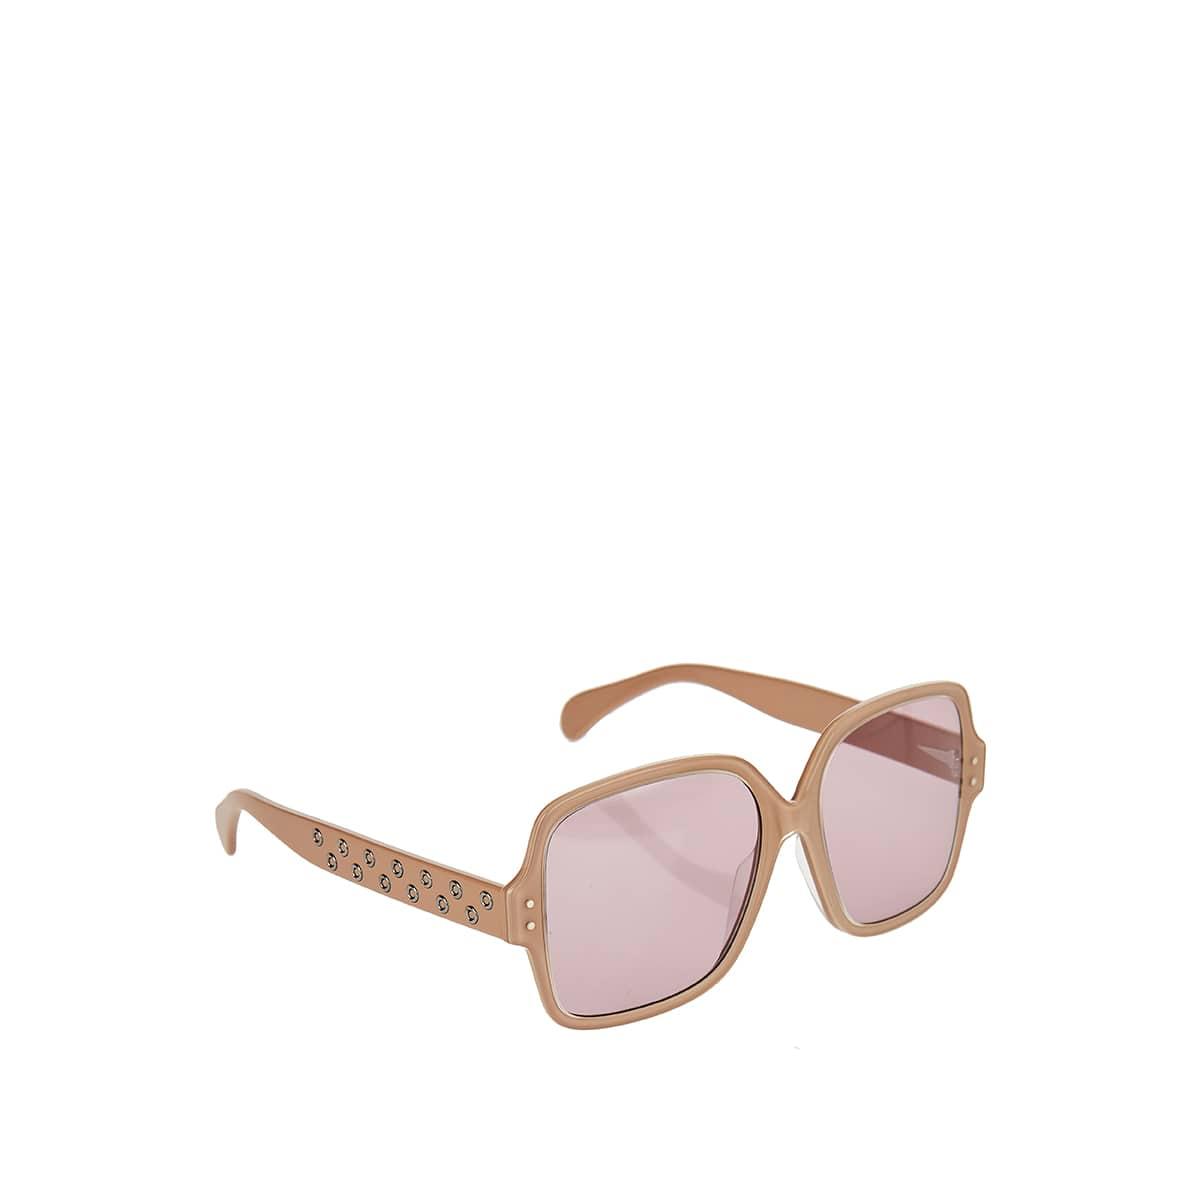 Oversized square studded sunglasses